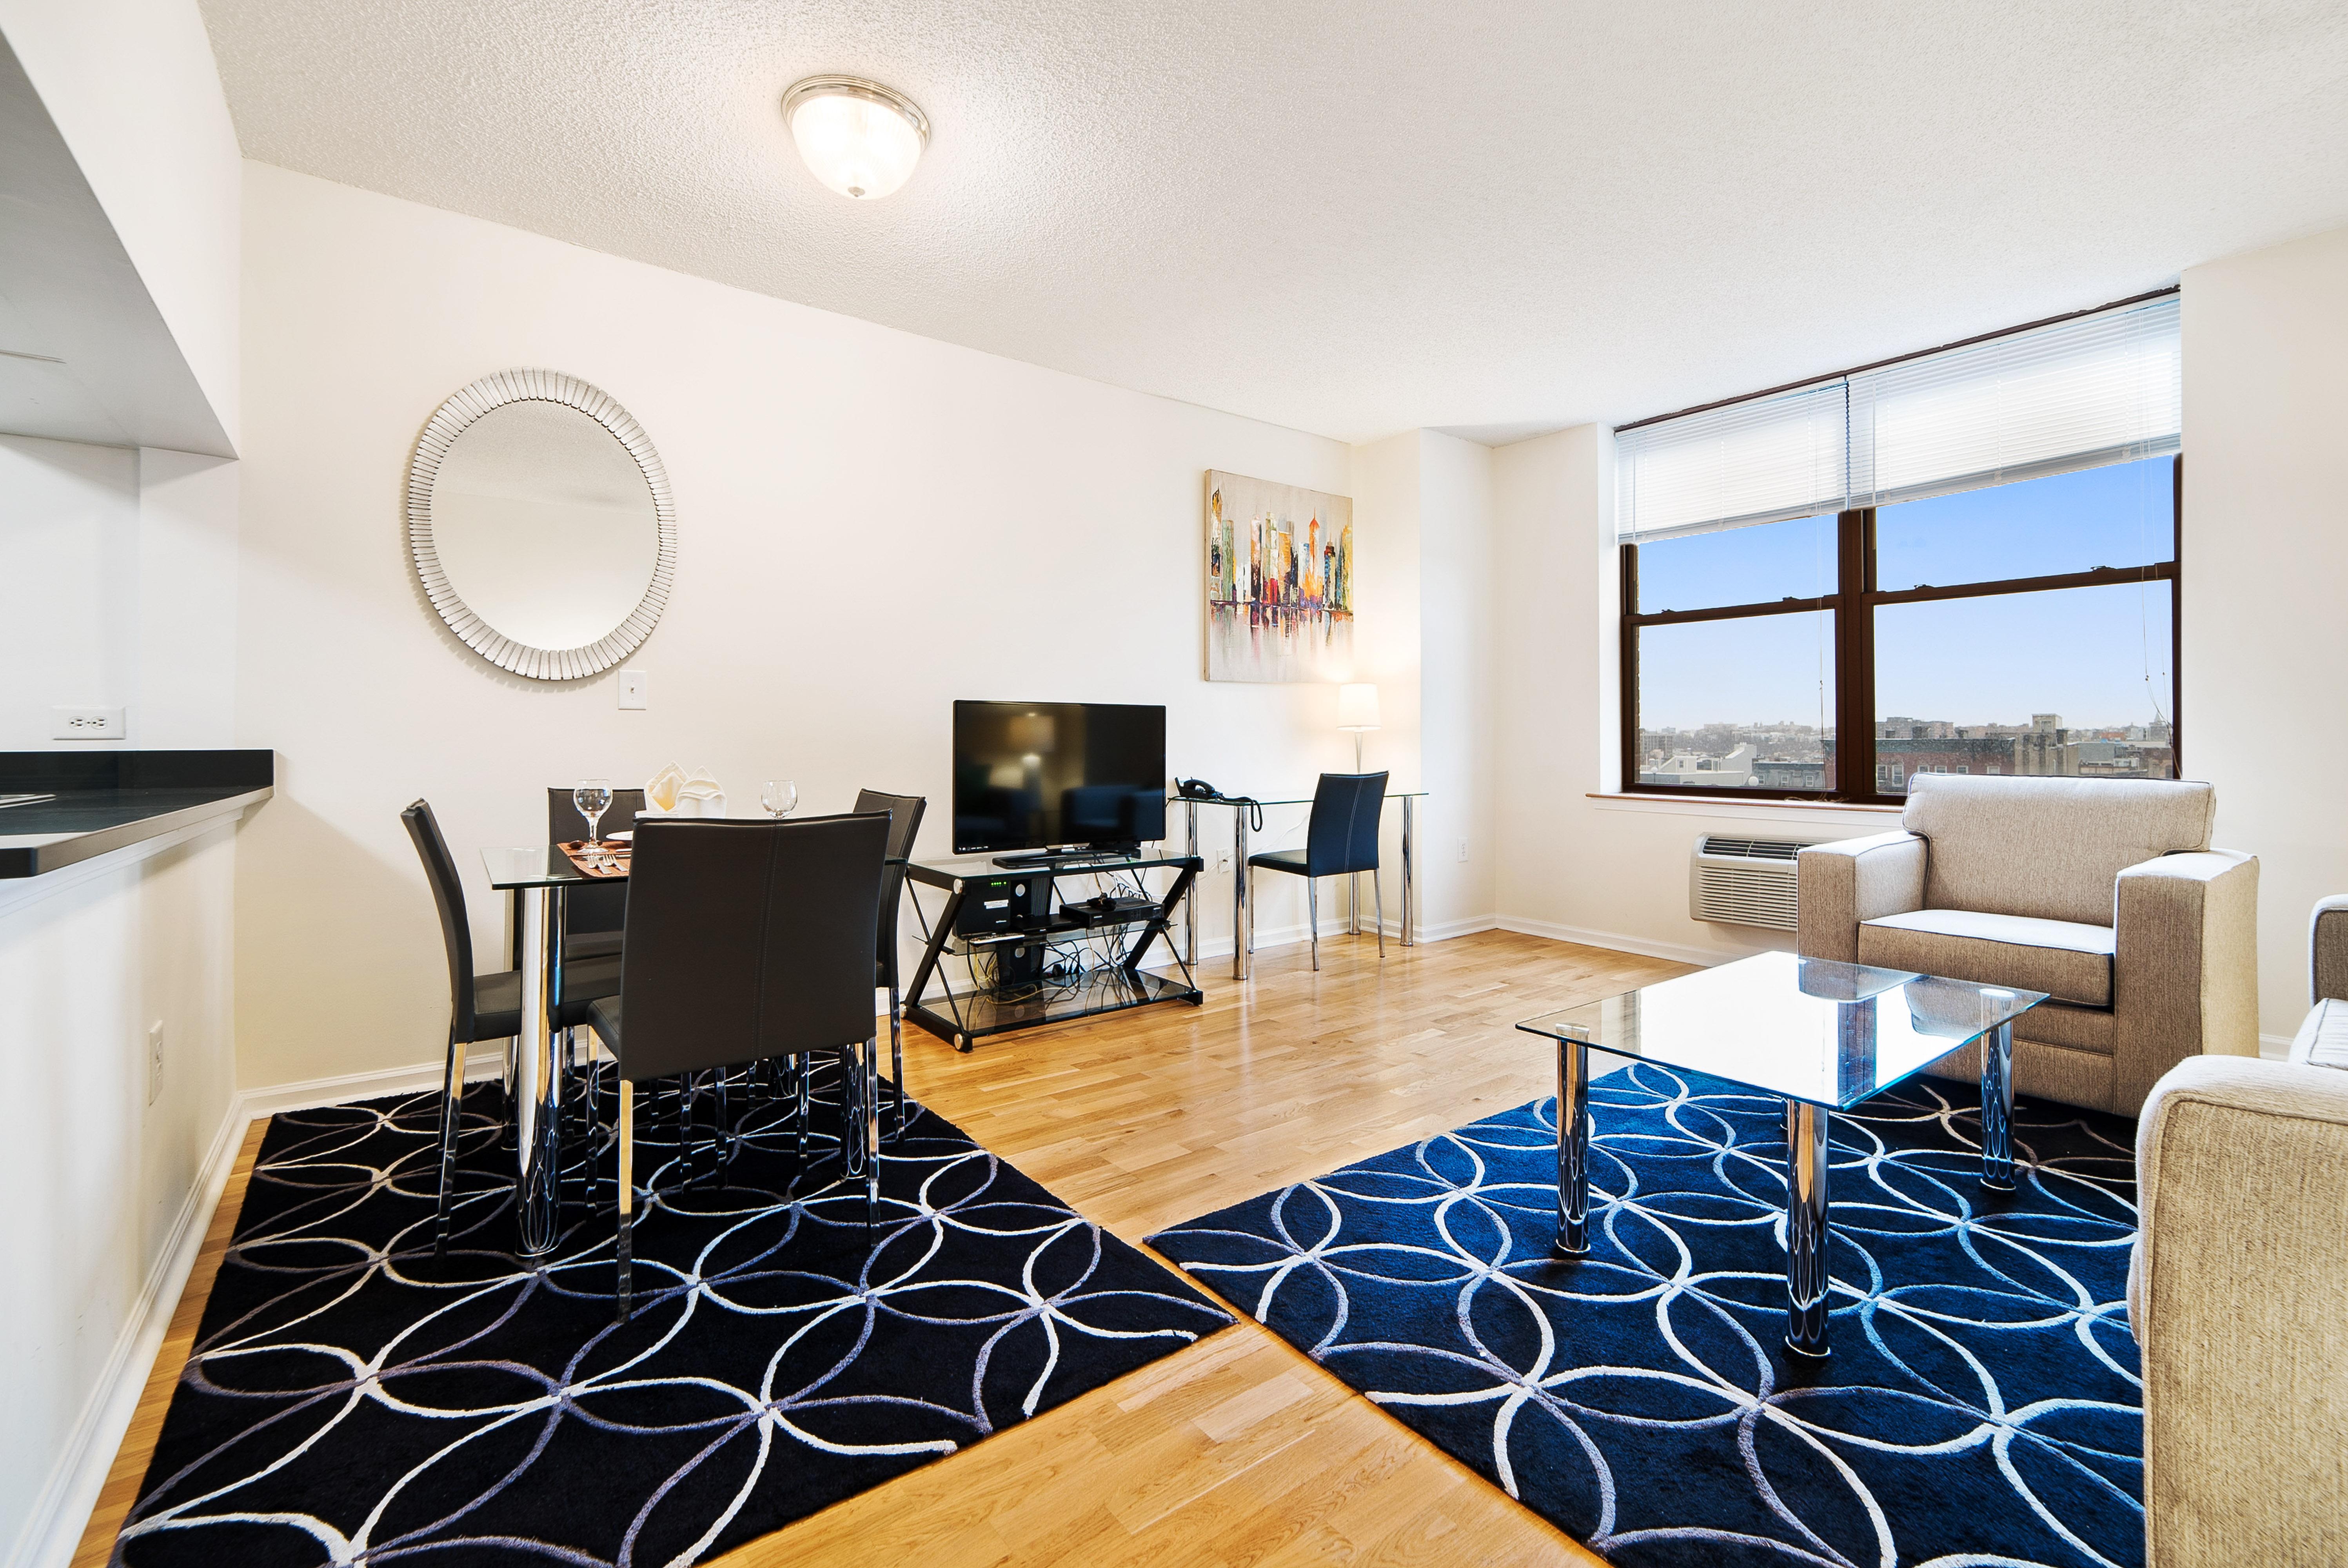 image 8 furnished 1 bedroom Apartment for rent in Hoboken, Hudson County